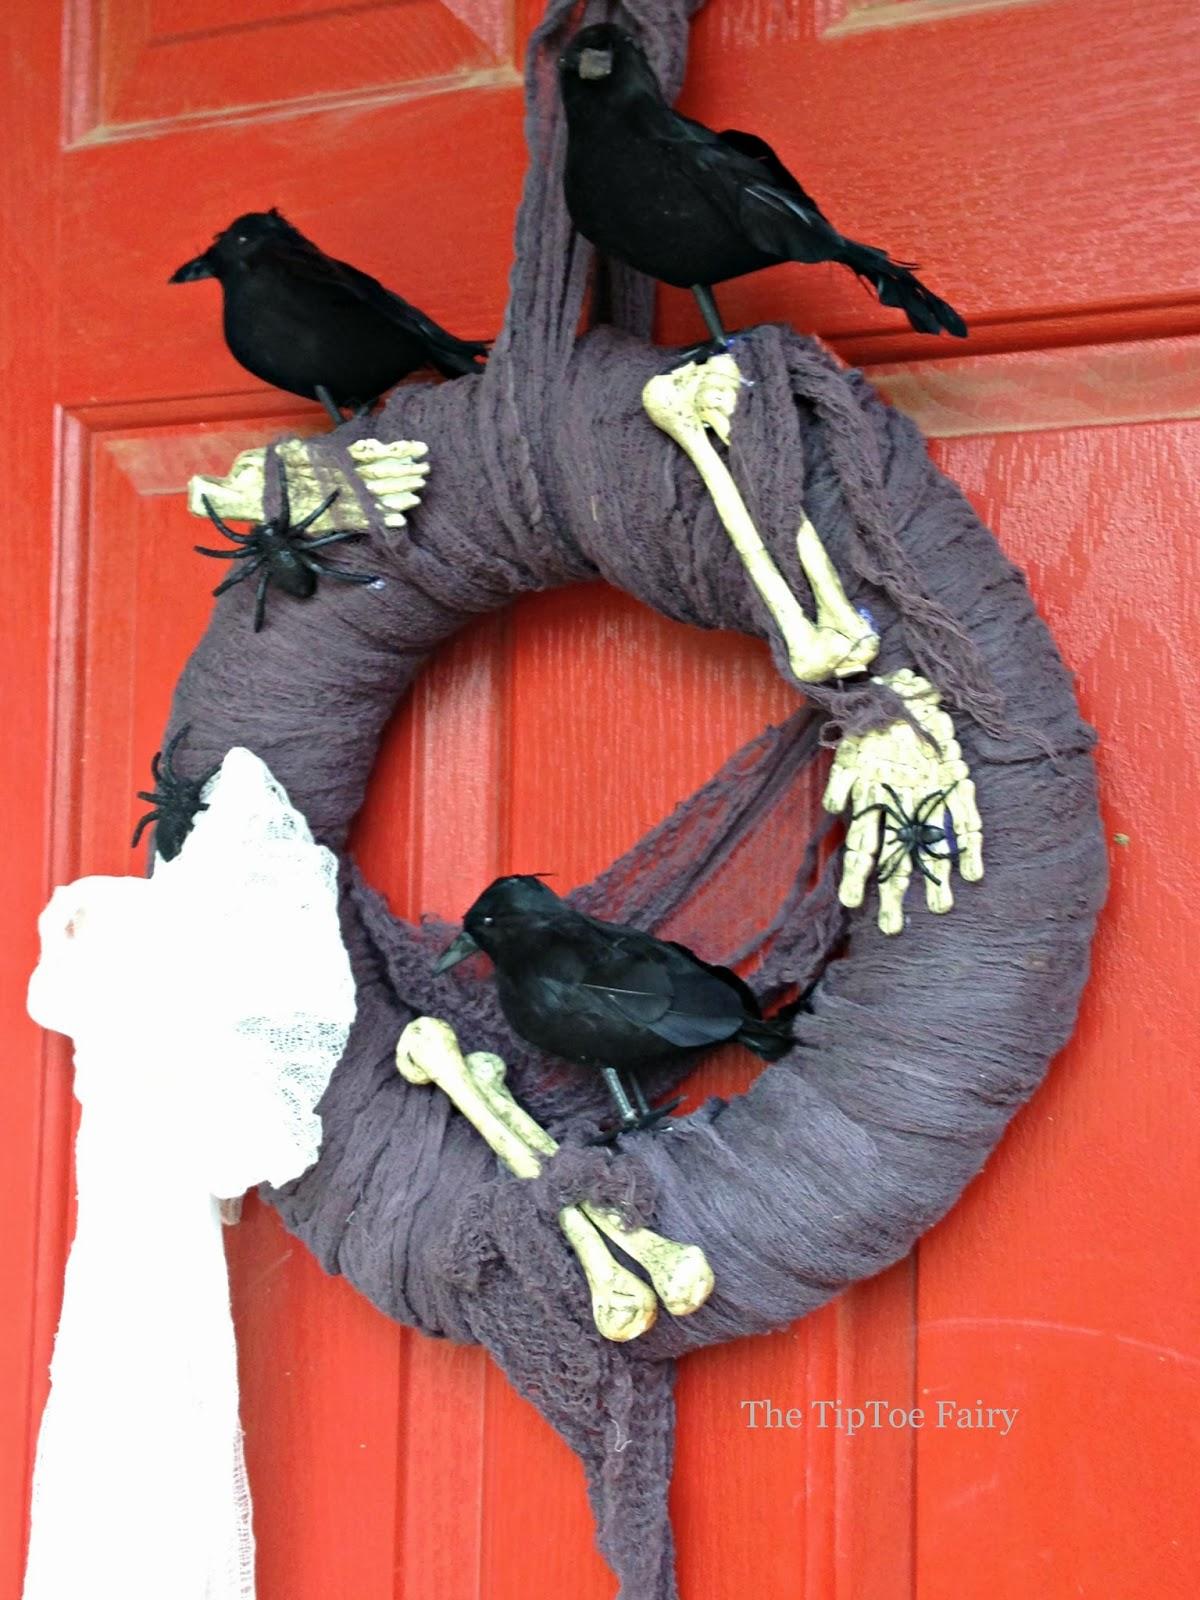 Diy halloween wreath - Creepy Crows And Bones Halloween Wreath The Tiptoe Fairy Halloweendecorations Halloween Wreathtutorial